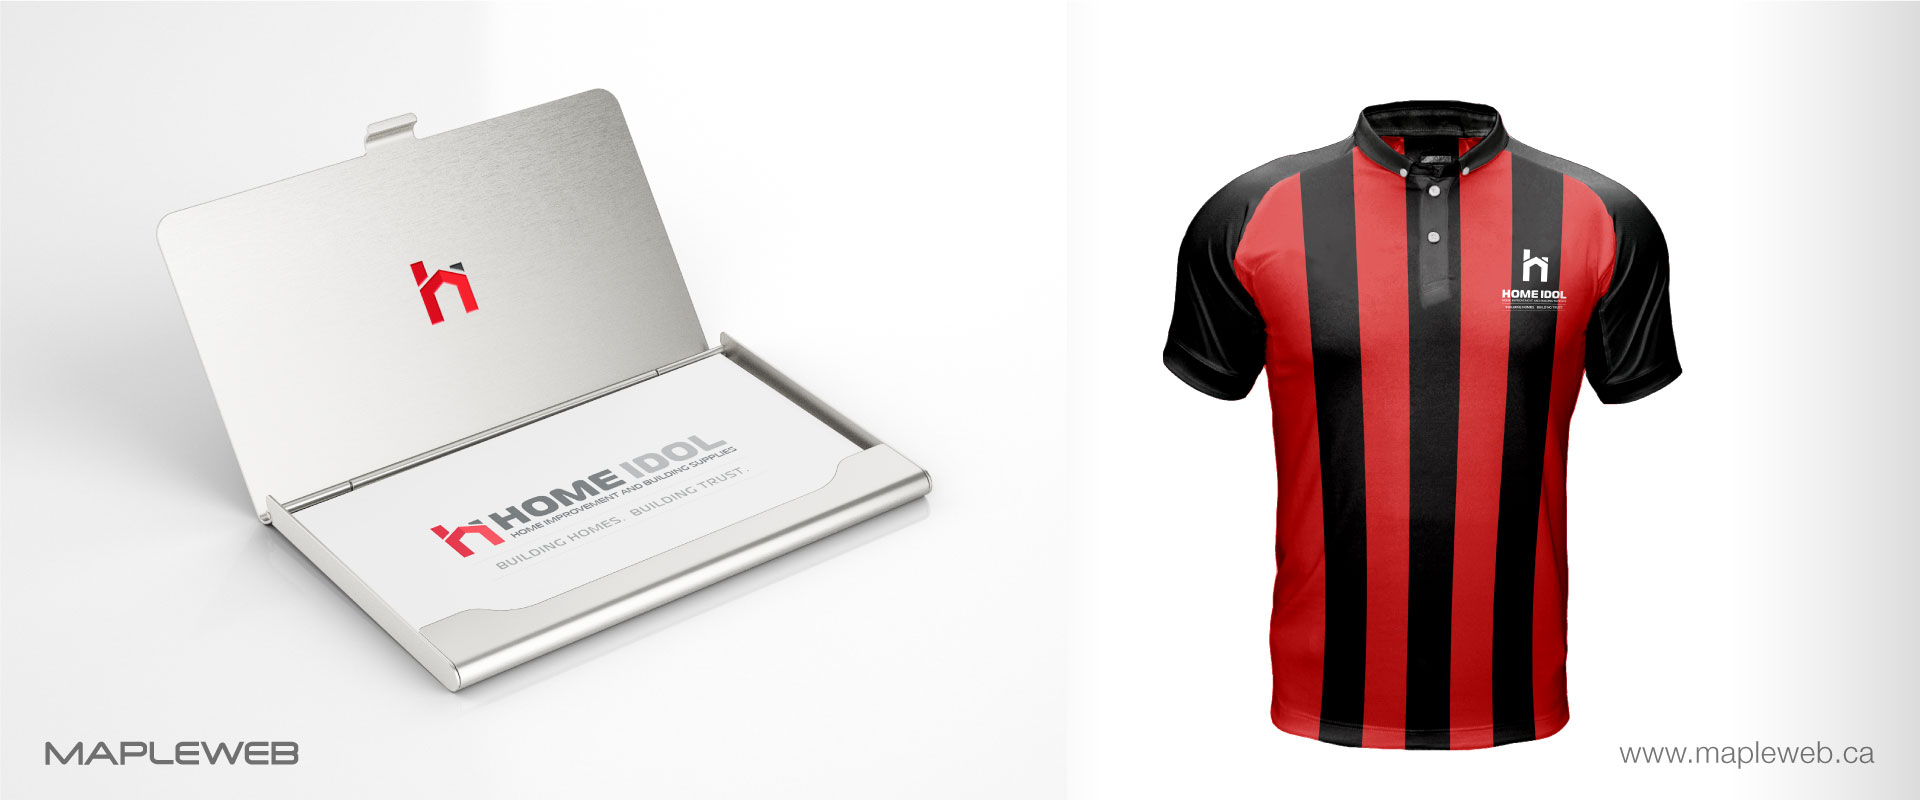 home-idol-brand-logo-design-by-mapleweb-vancouver-canada-tshirt-business-card-mock